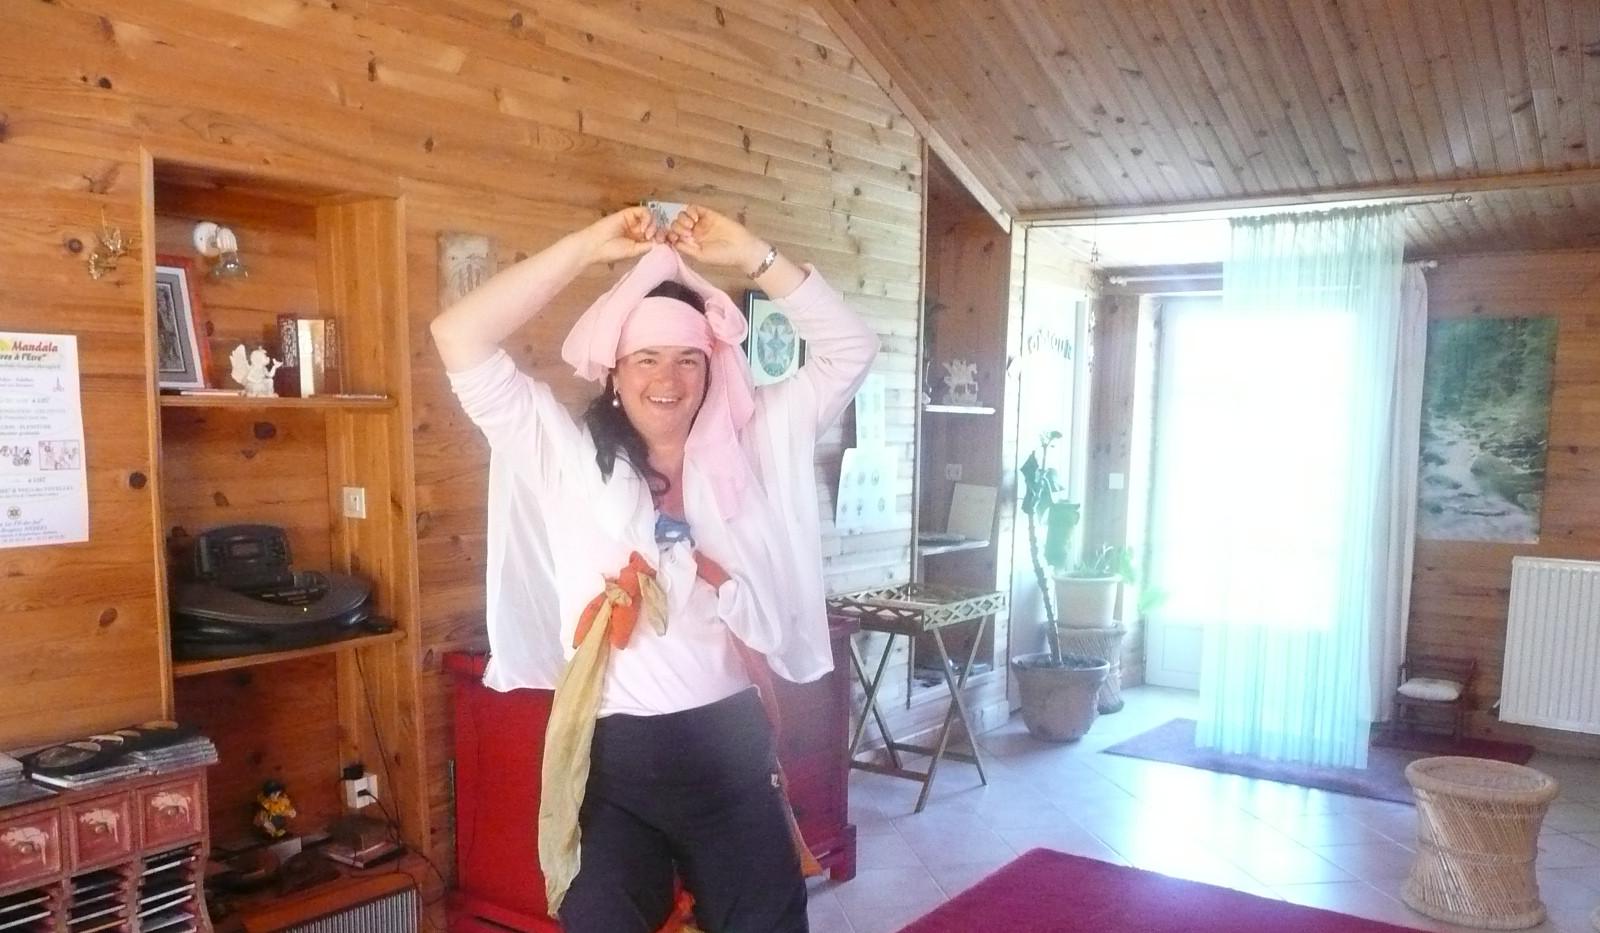 coaching-danse-le-fil-de-soi-vendee-3.JP